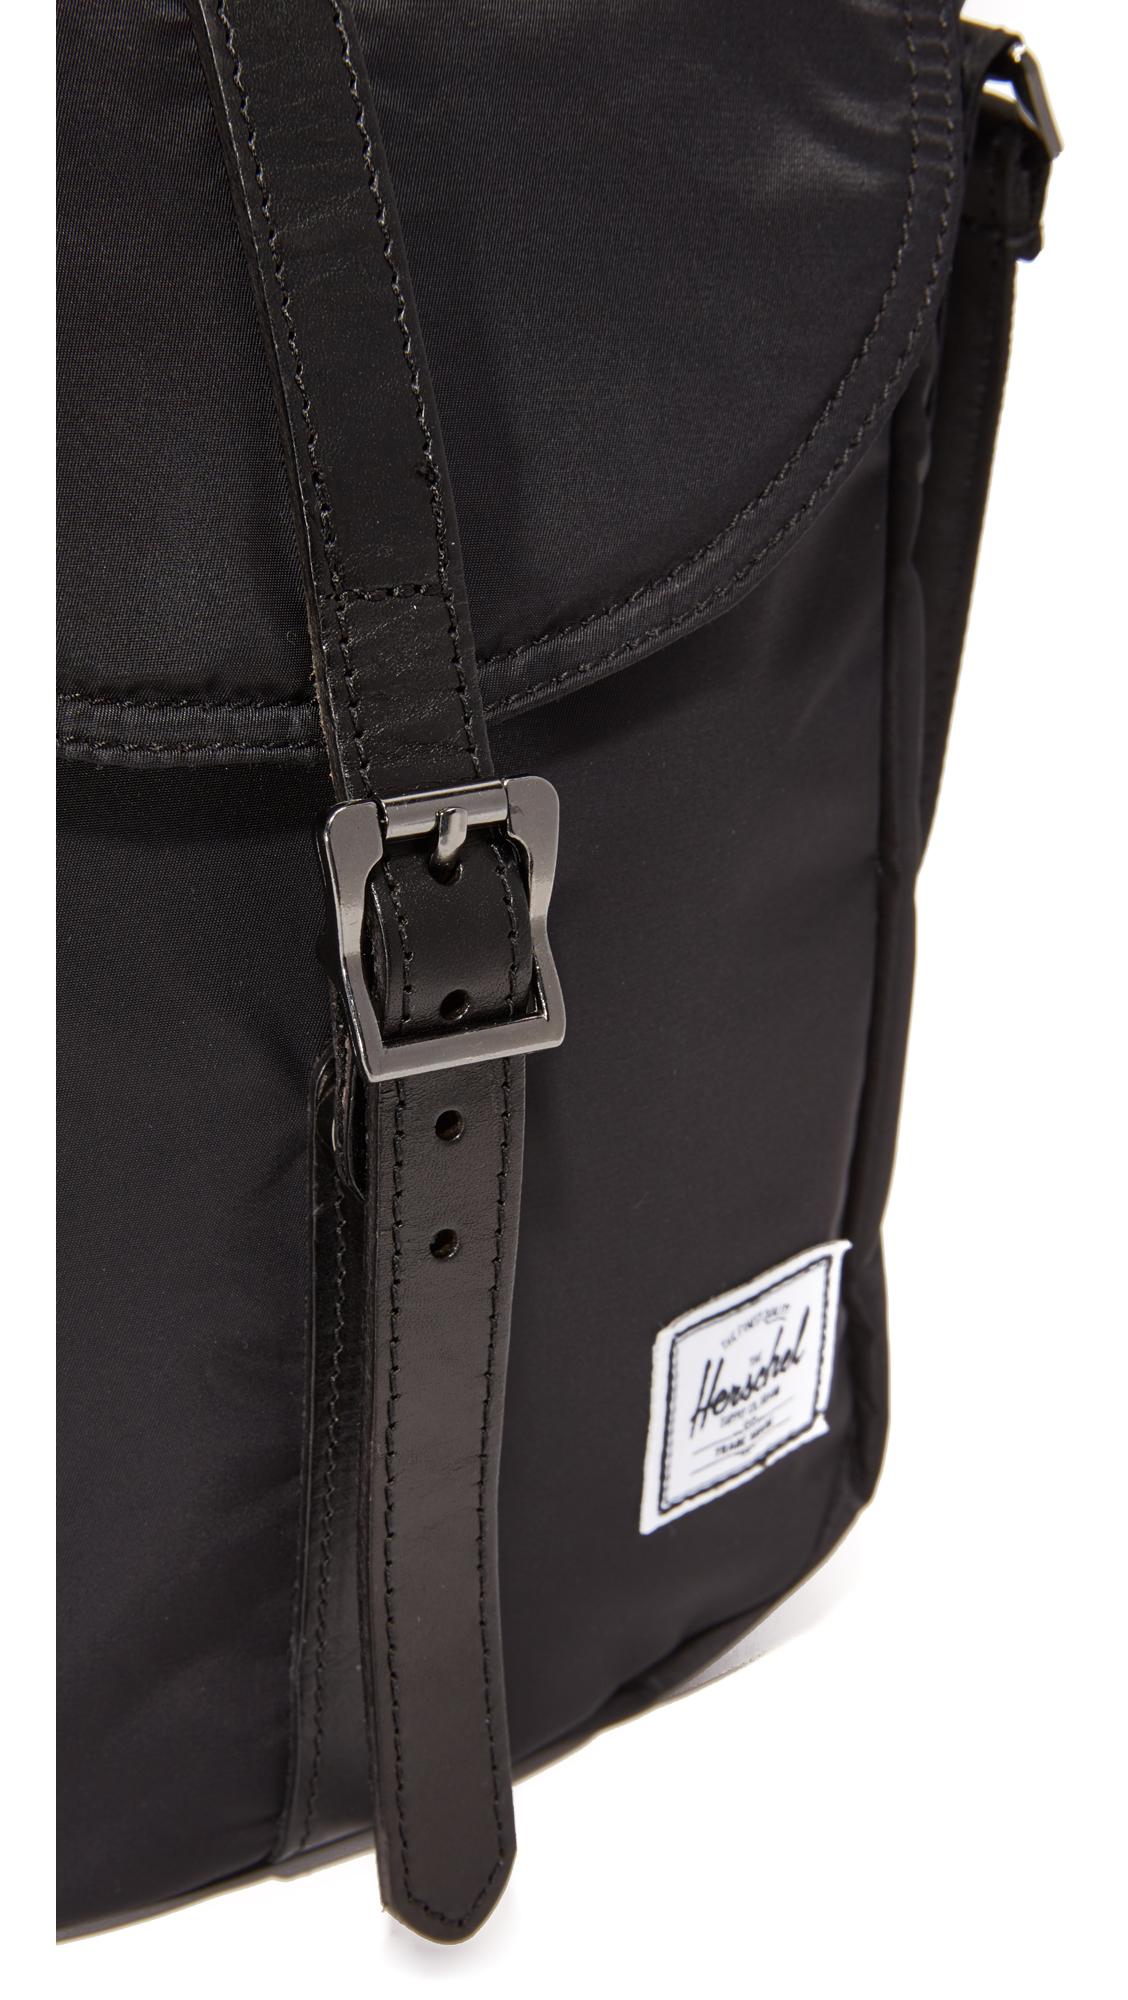 Herschel Supply Co. Kingsgate Cross Body Bag  caaa77939bc29